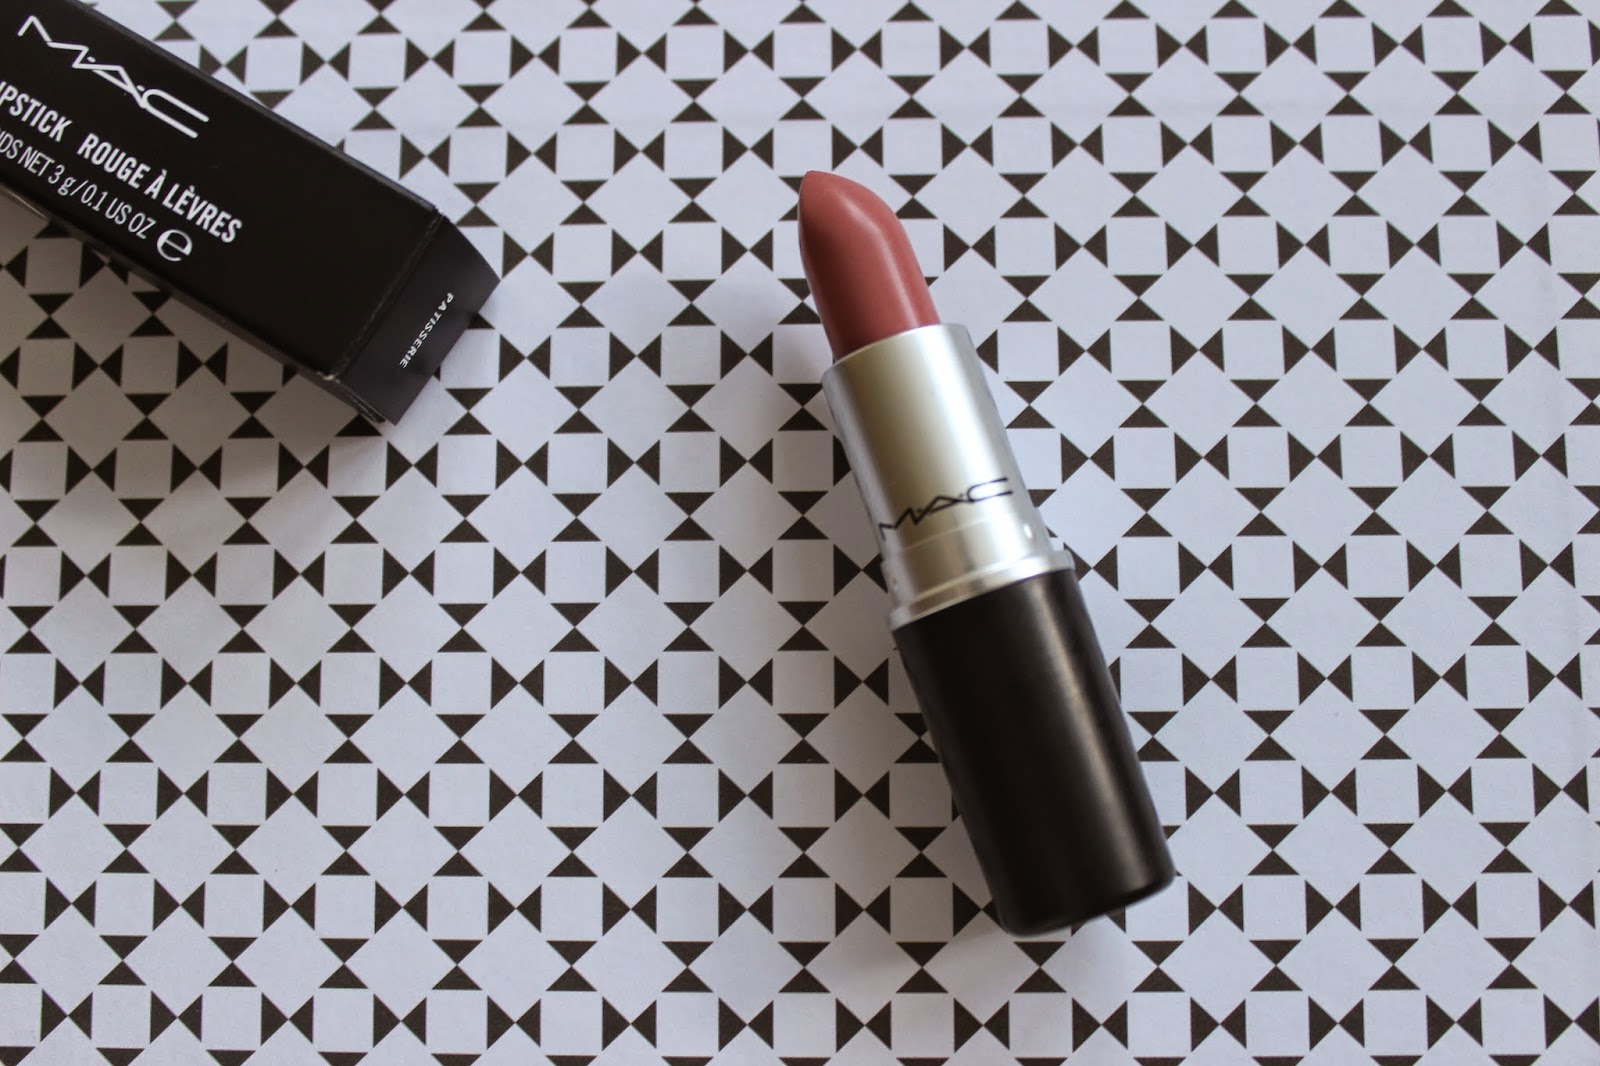 Mac lipstick collection | Olivia Mulhearn